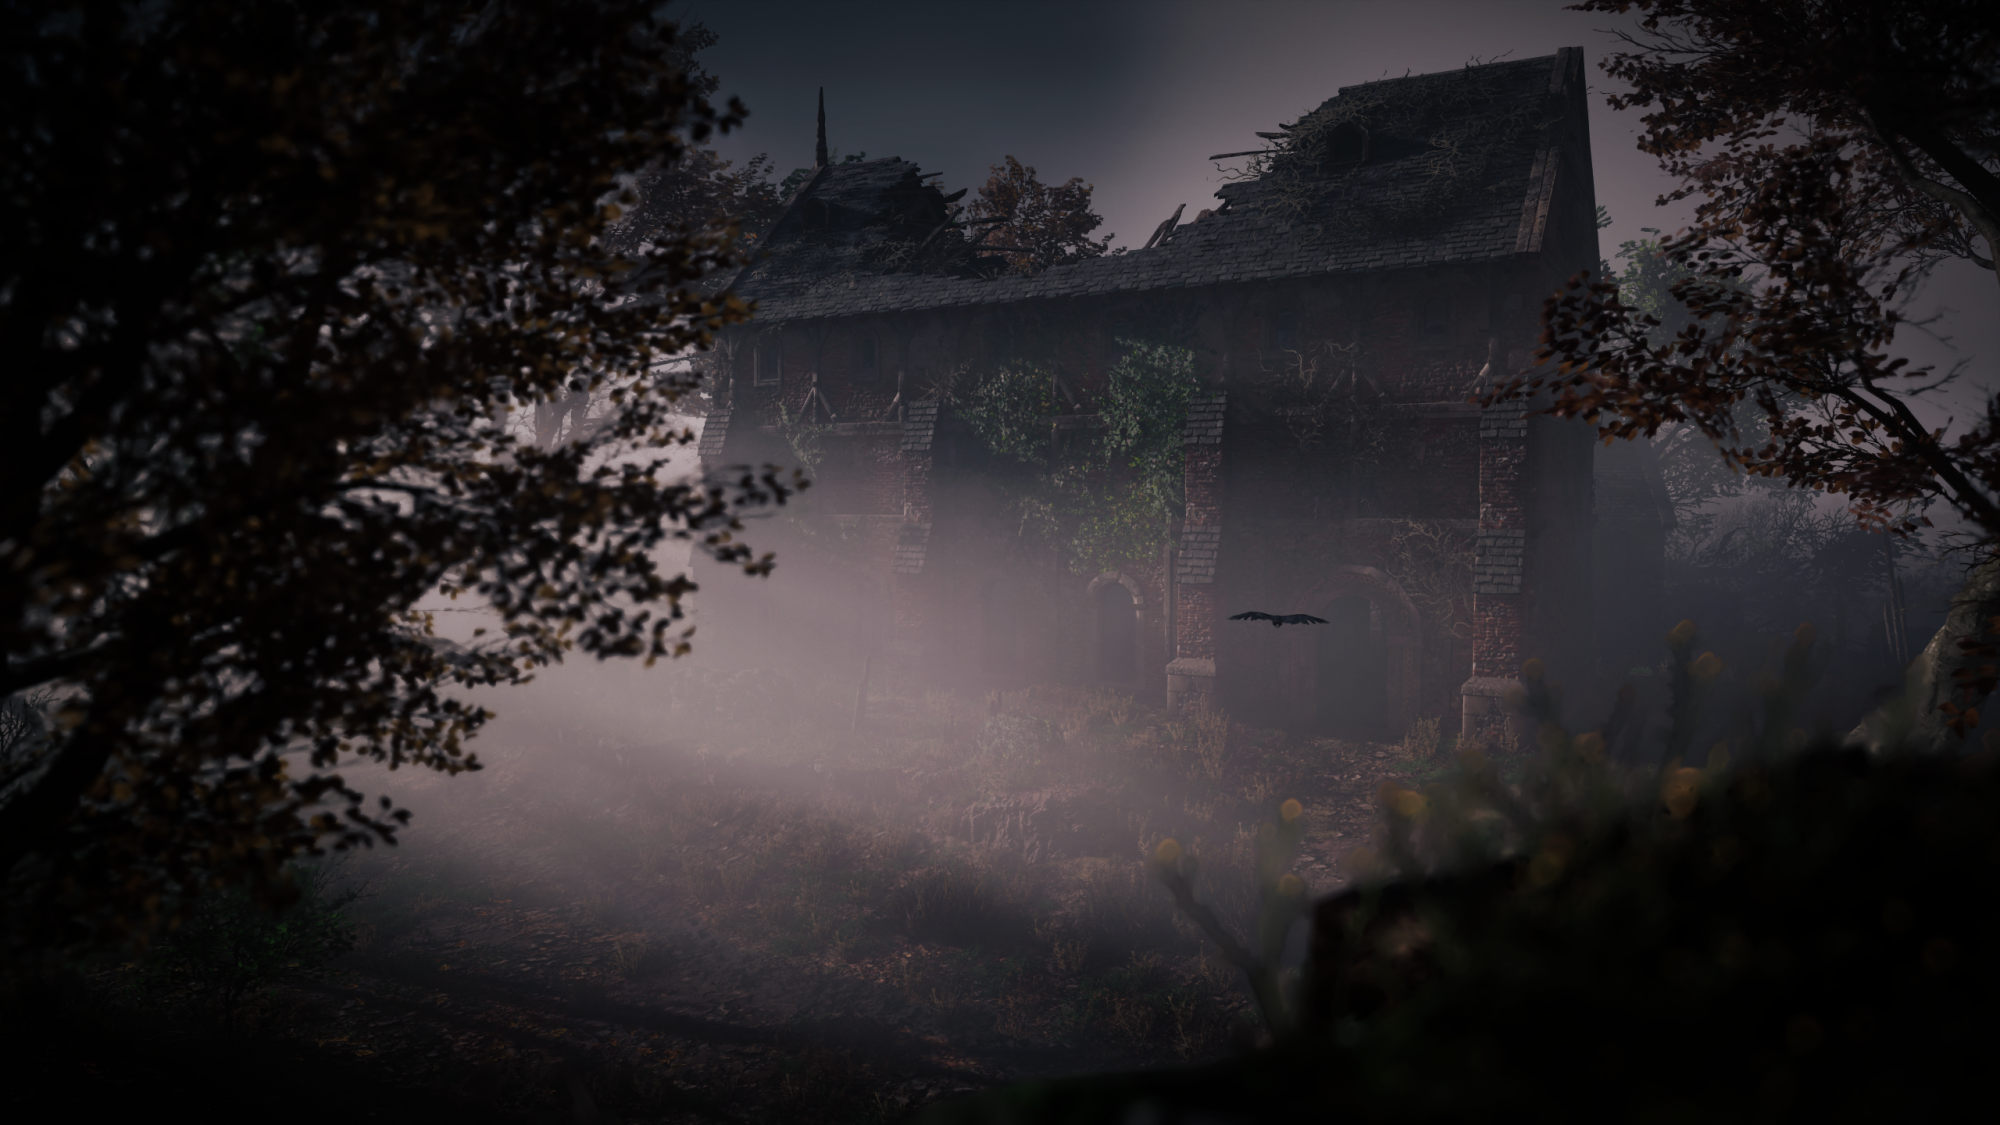 Assassin's Creed Valhalla Screenshot 2020.11.19 - 02.19.33.71.png